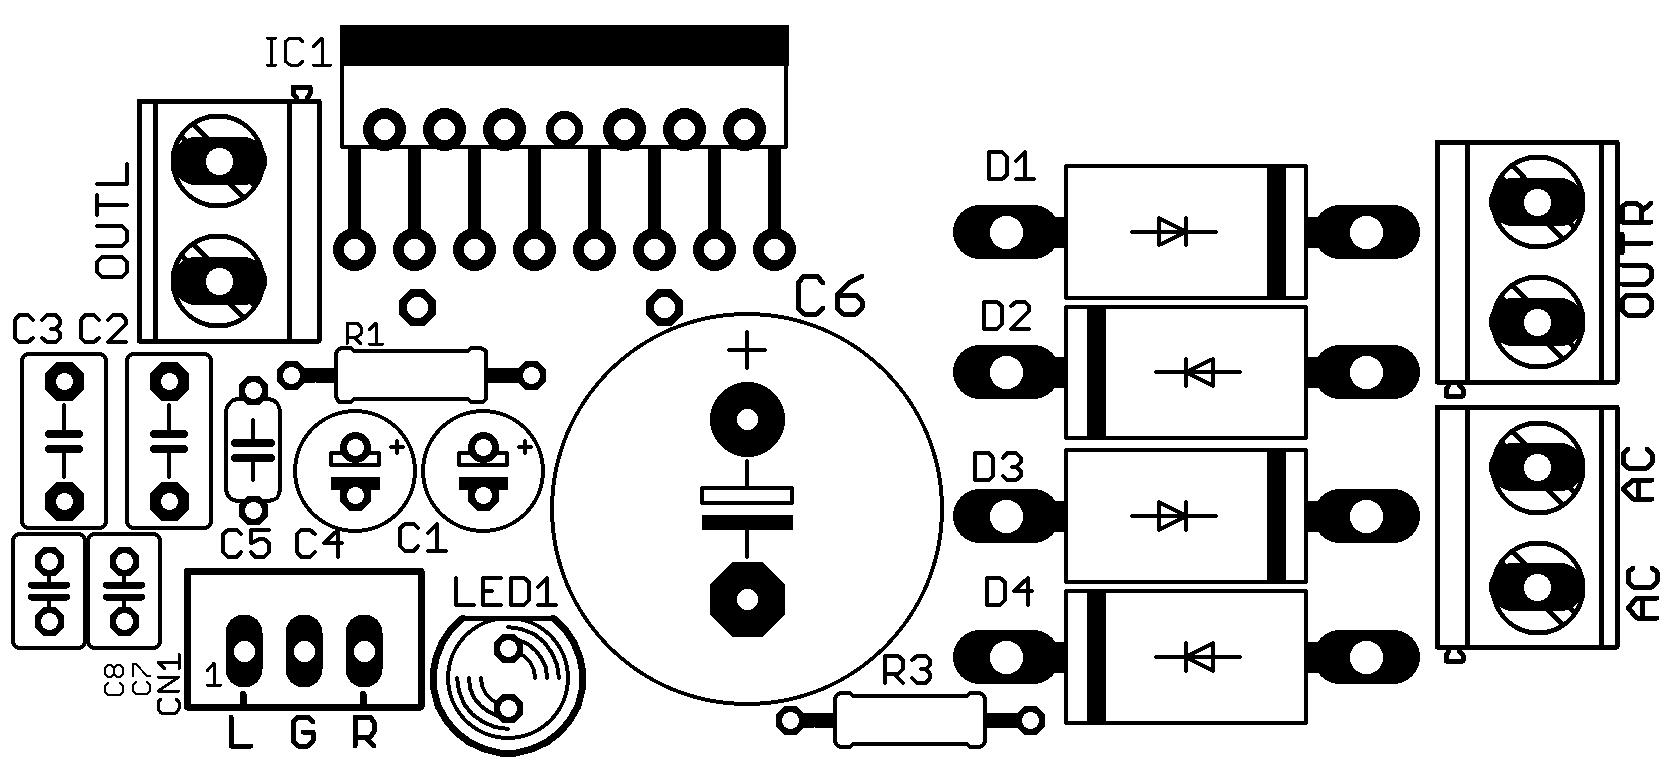 Circuito de amplificador potência com TDA7379 2 X 38 Watts